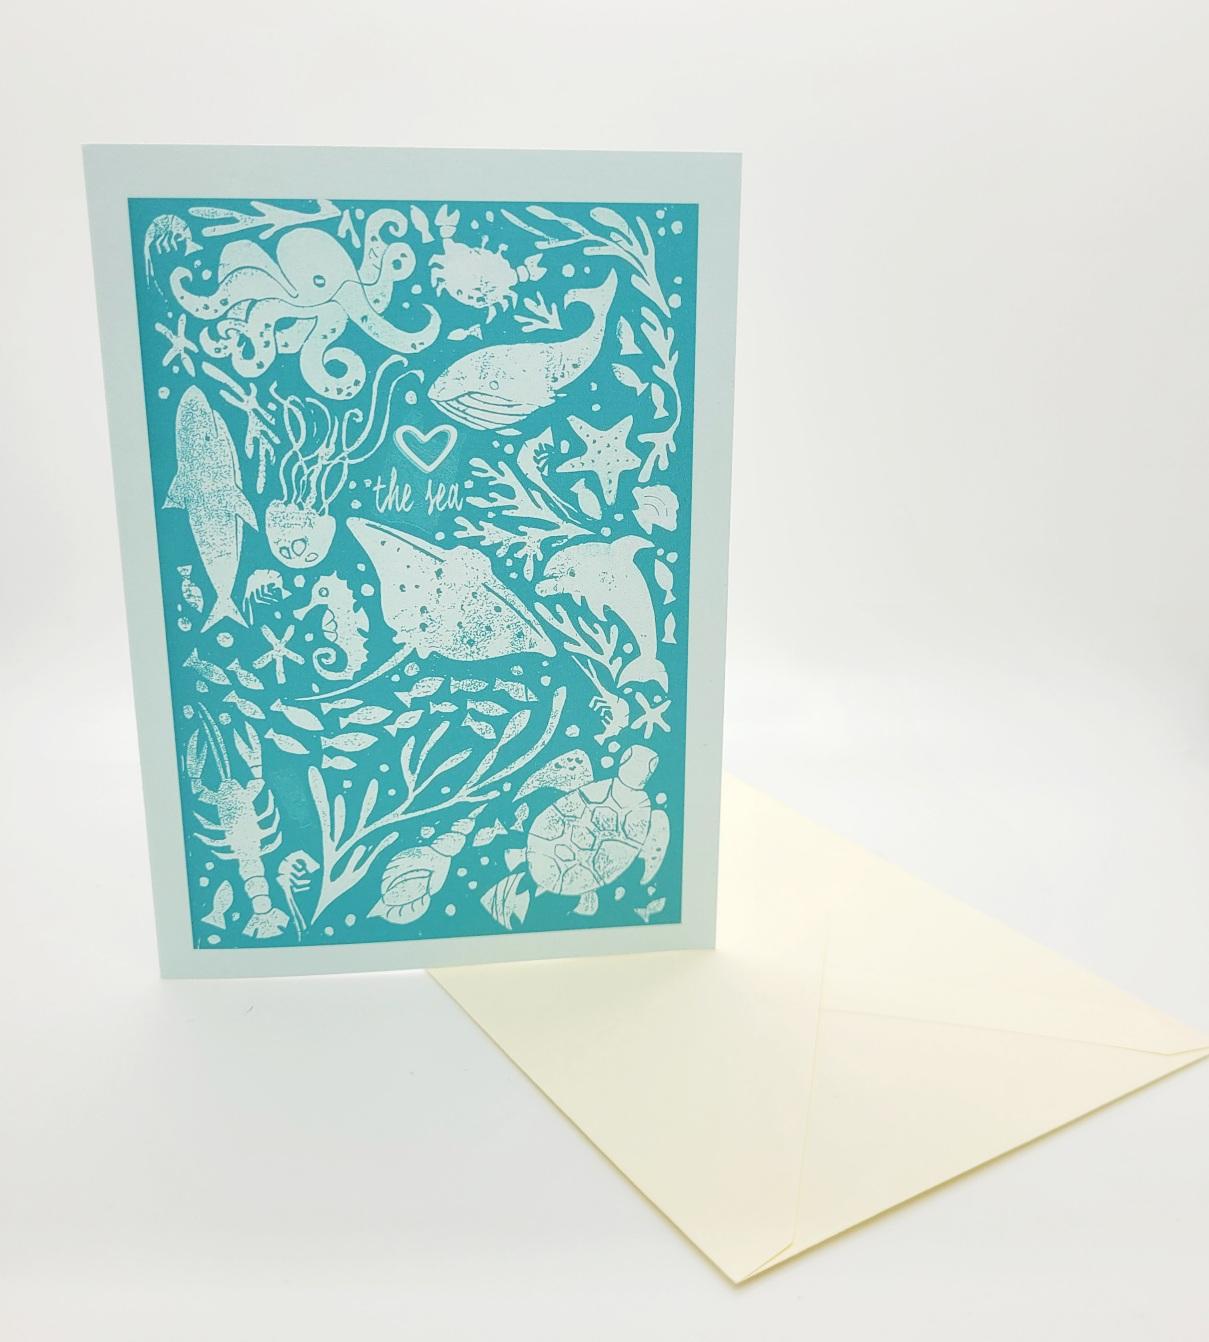 Greetings card. Love the sea